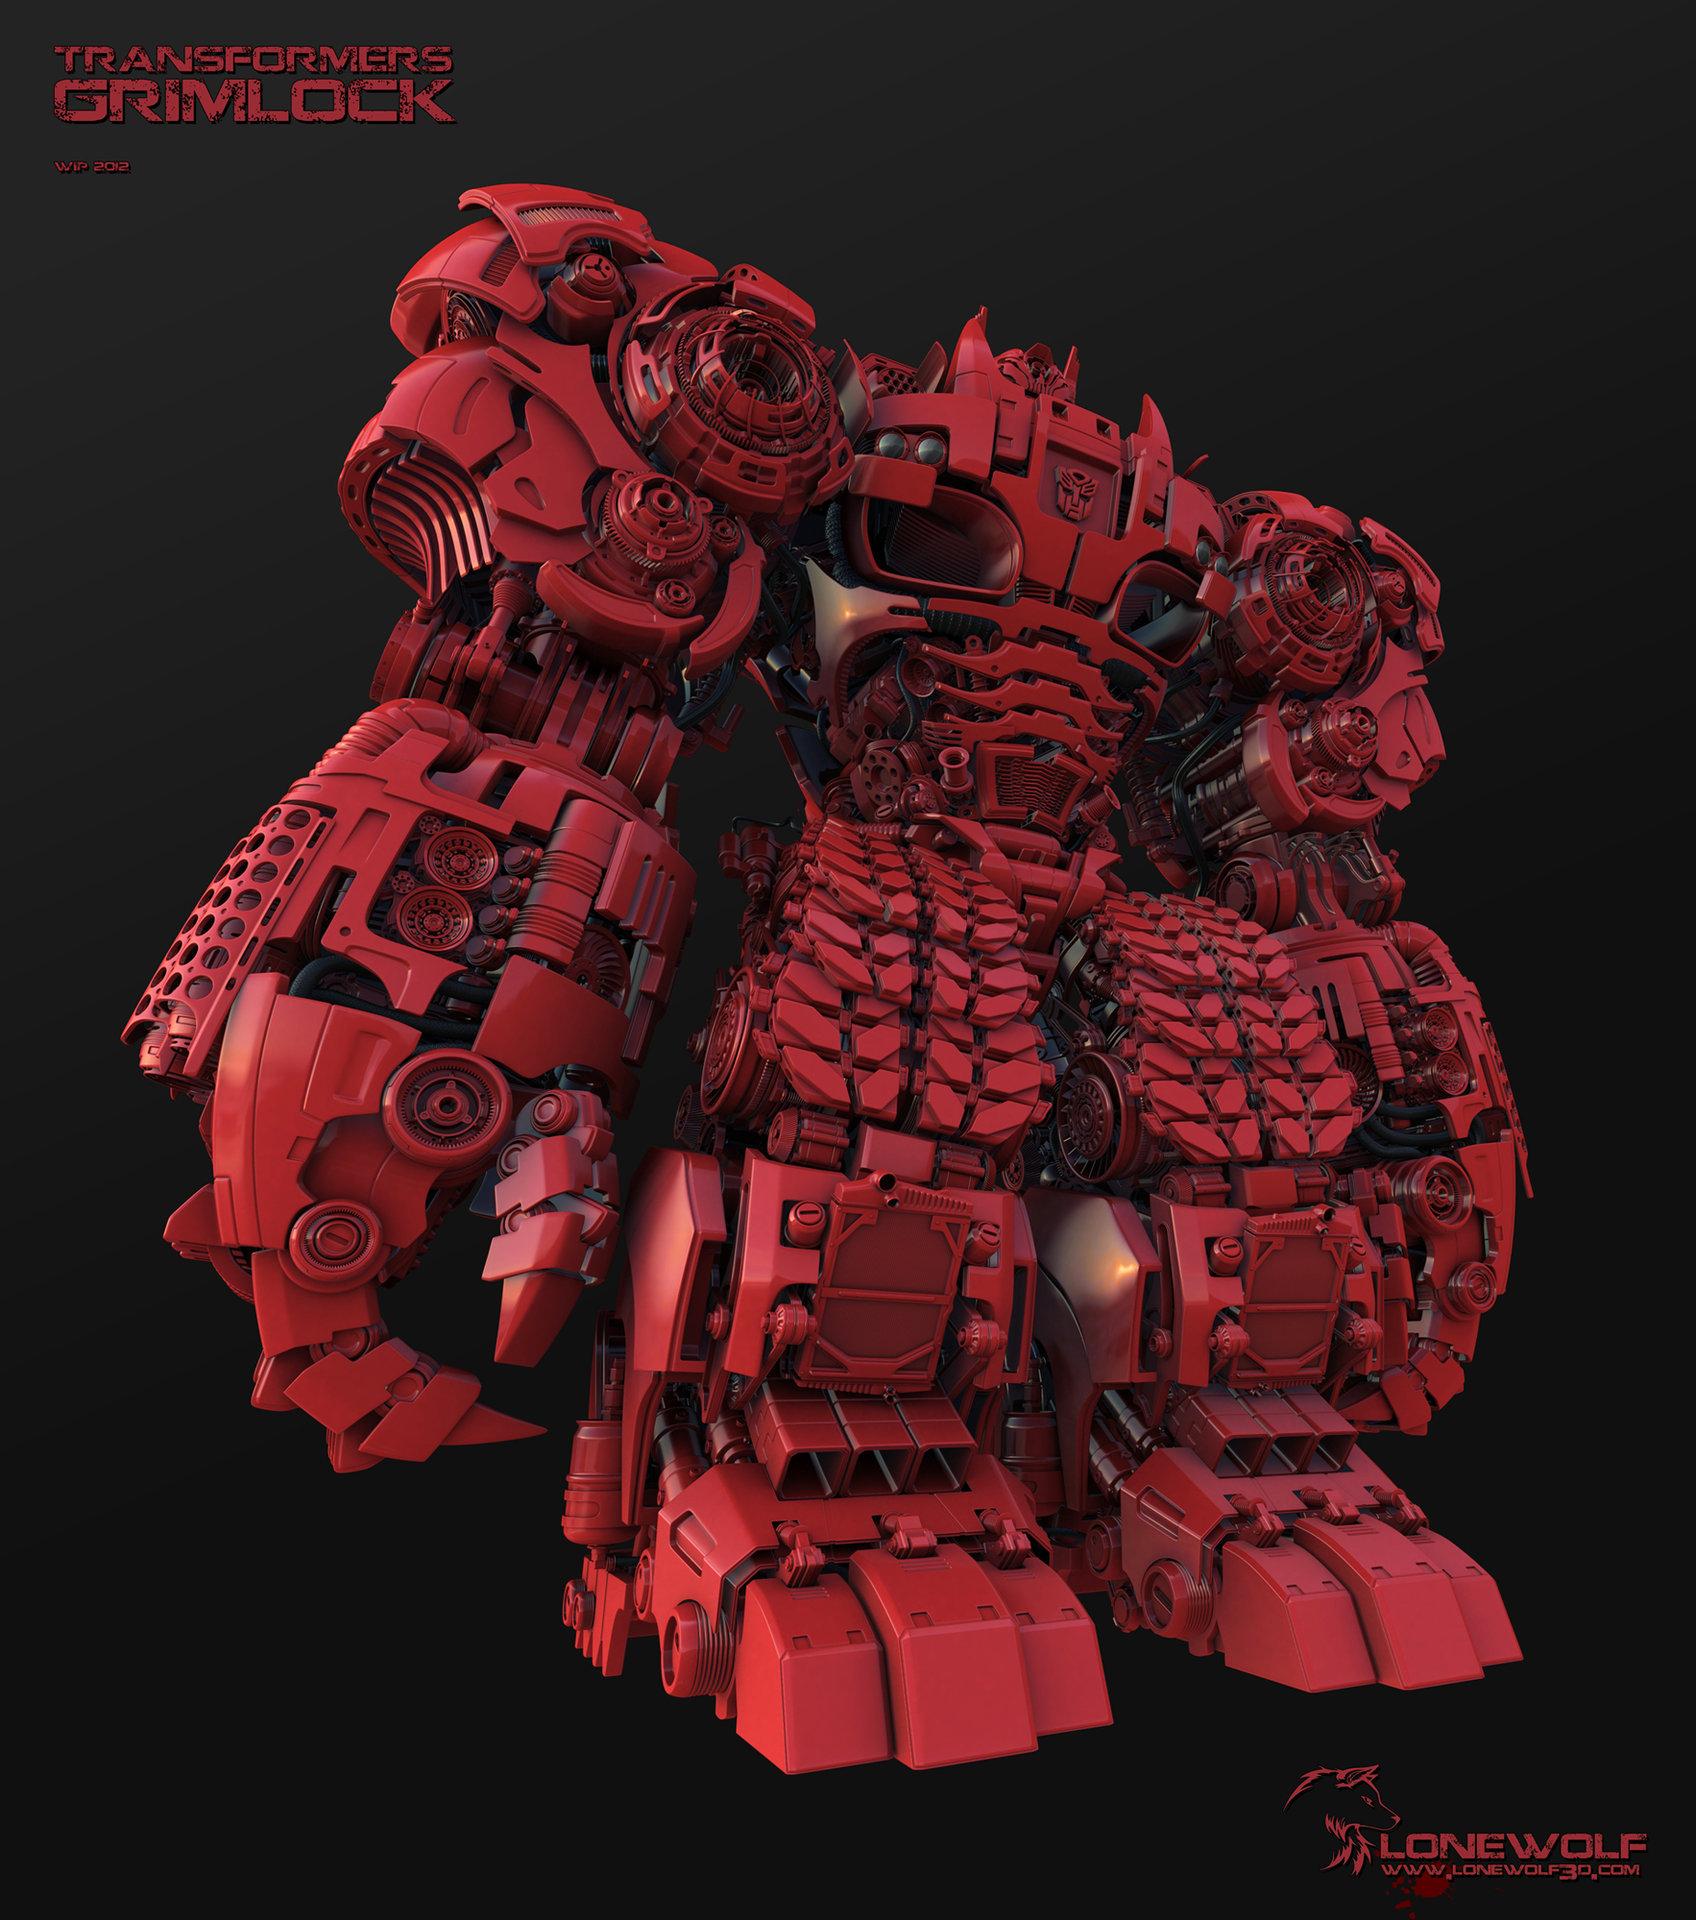 Grimlock transformers tf4 01